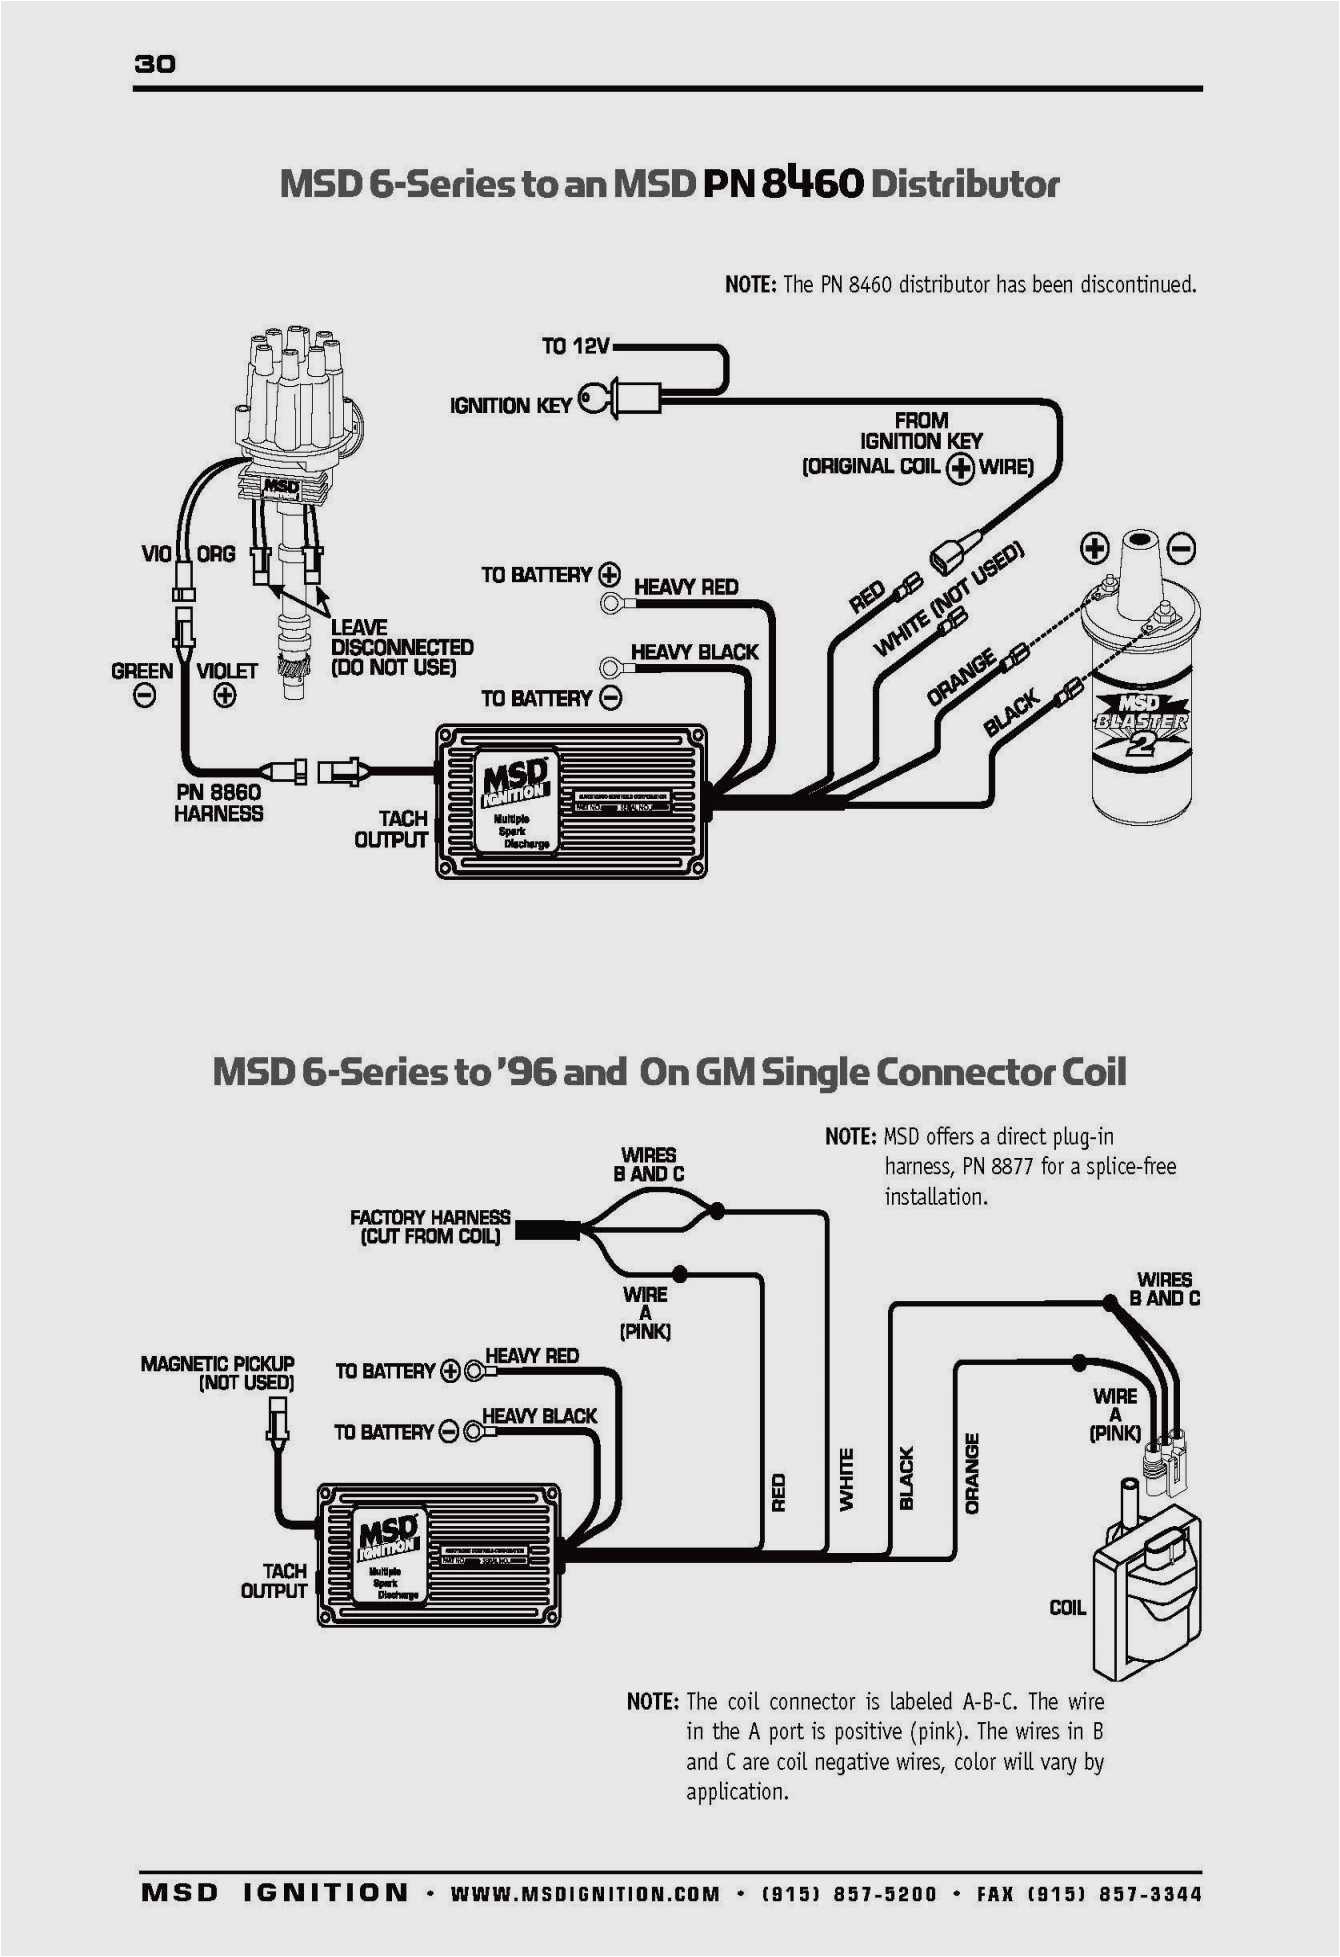 msd 5520 ignition wiring diagram wiring diagram name msd street fire ignition wiring diagram